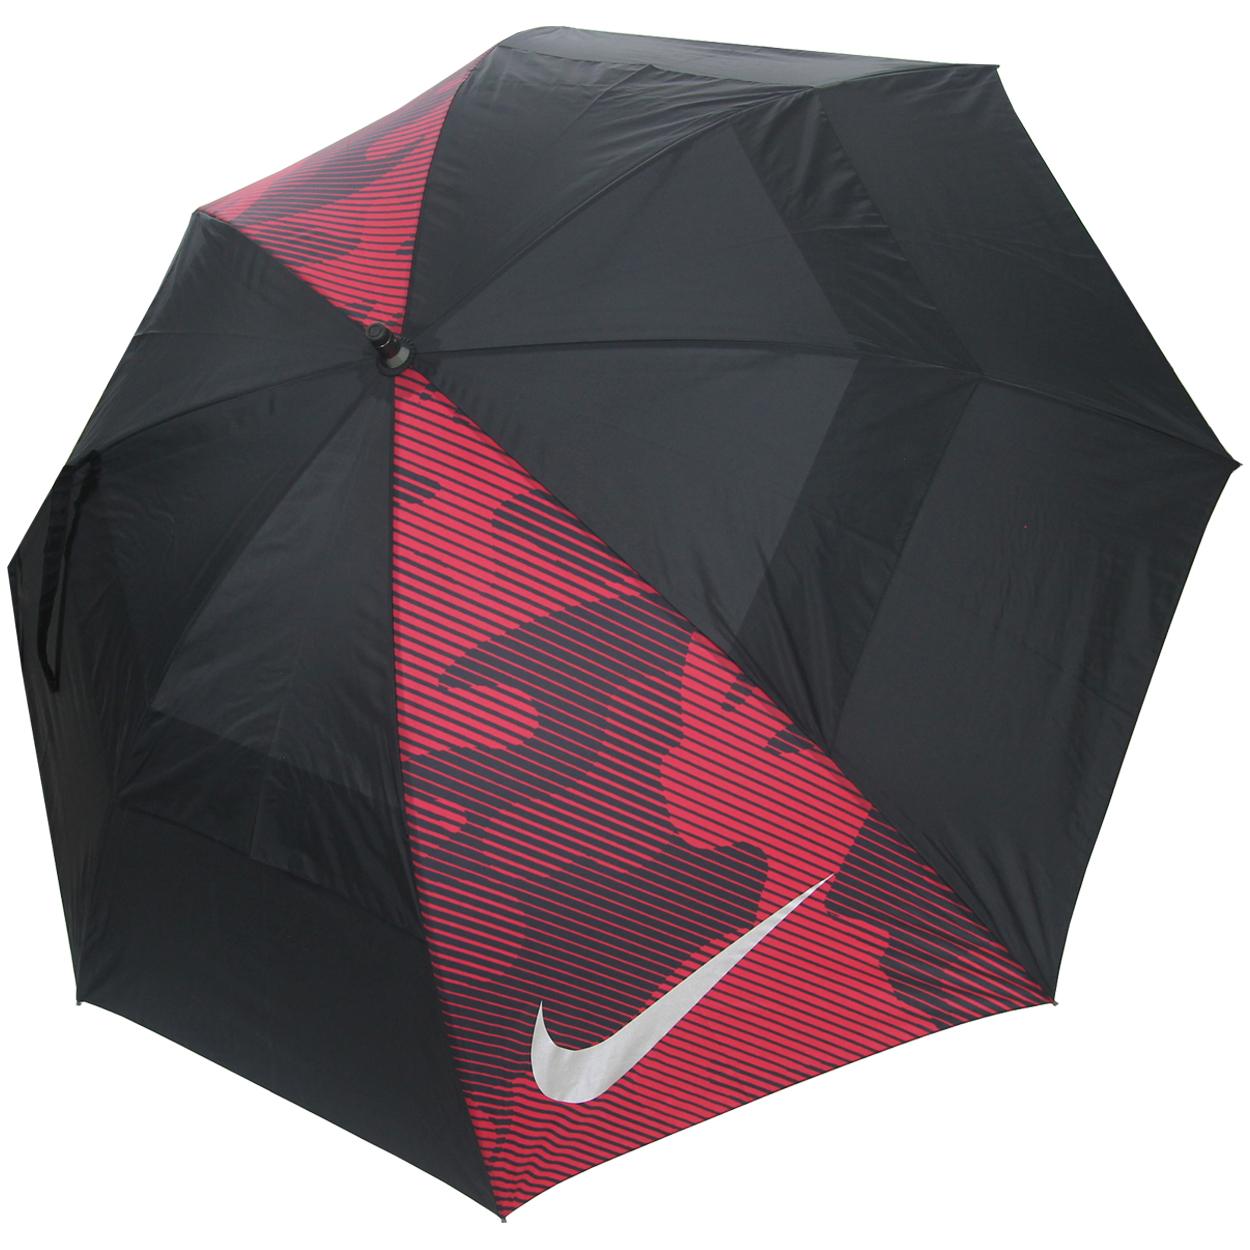 https://d3d71ba2asa5oz.cloudfront.net/22001014/images/nikumb-90451-black-silver-1116.jpg